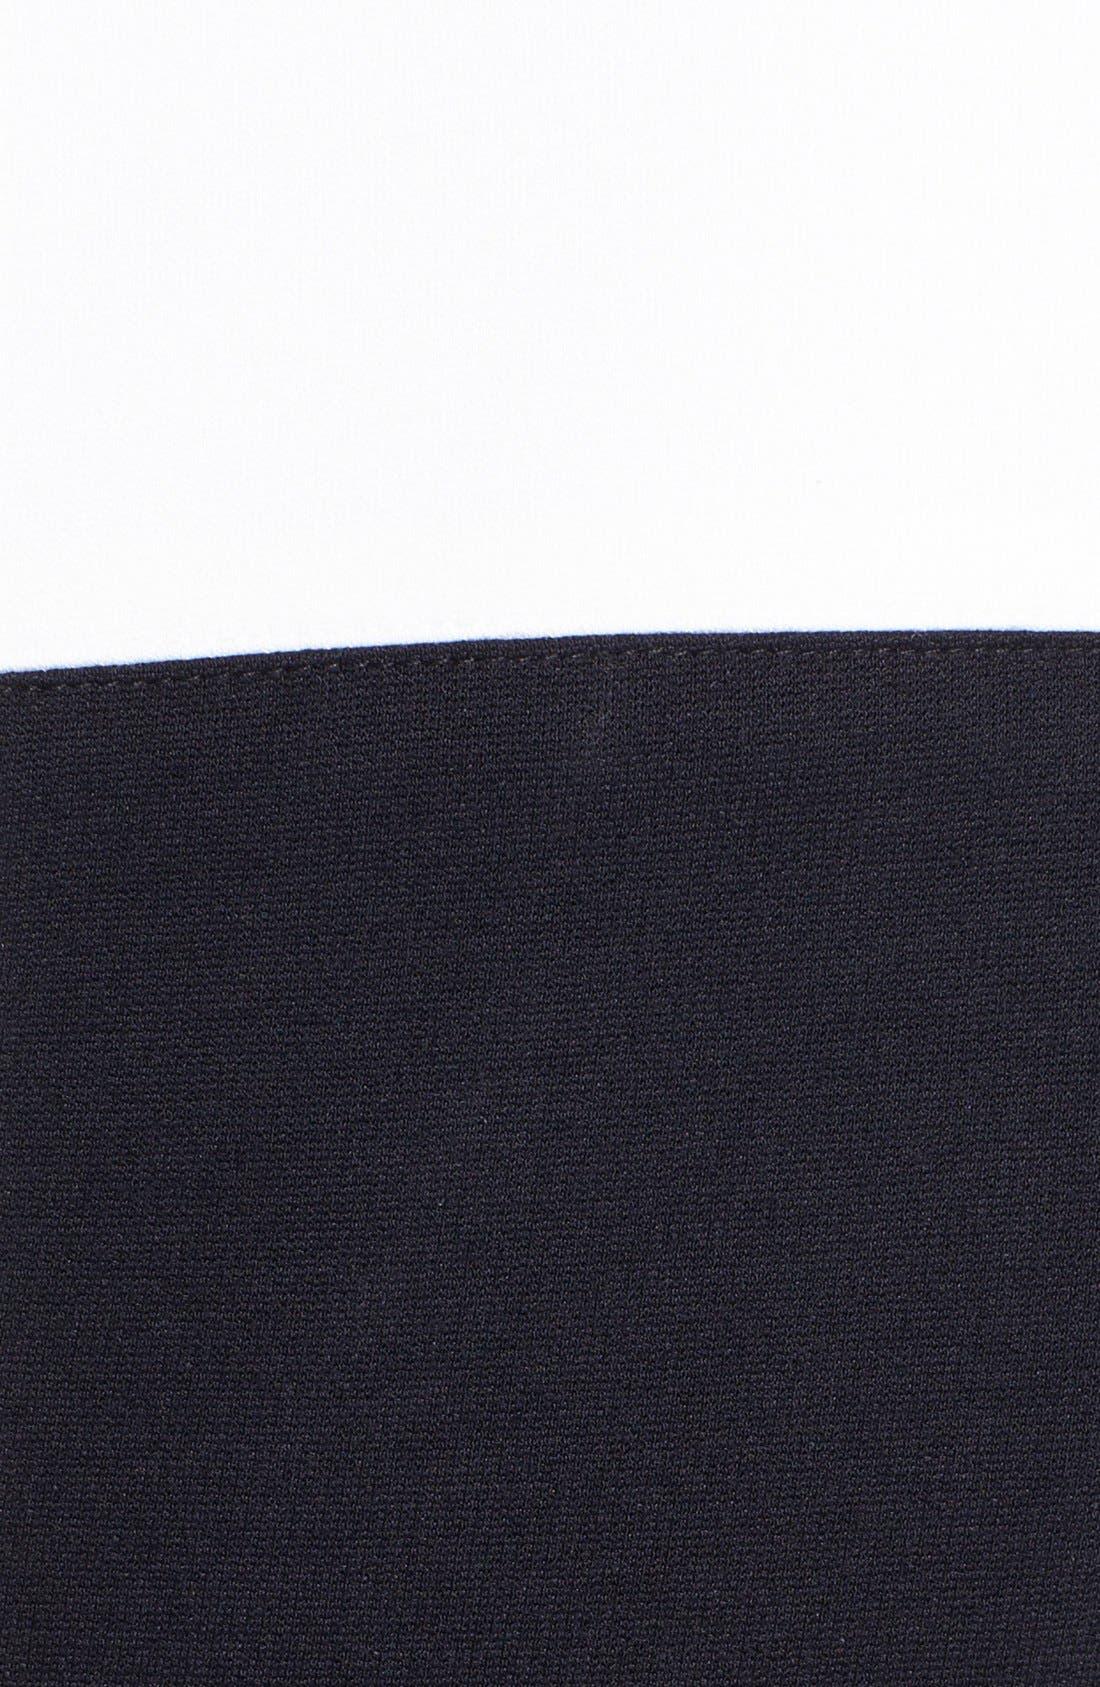 Alternate Image 3  - Ivy & Blu Colorblock Ponte Knit Sheath Dress